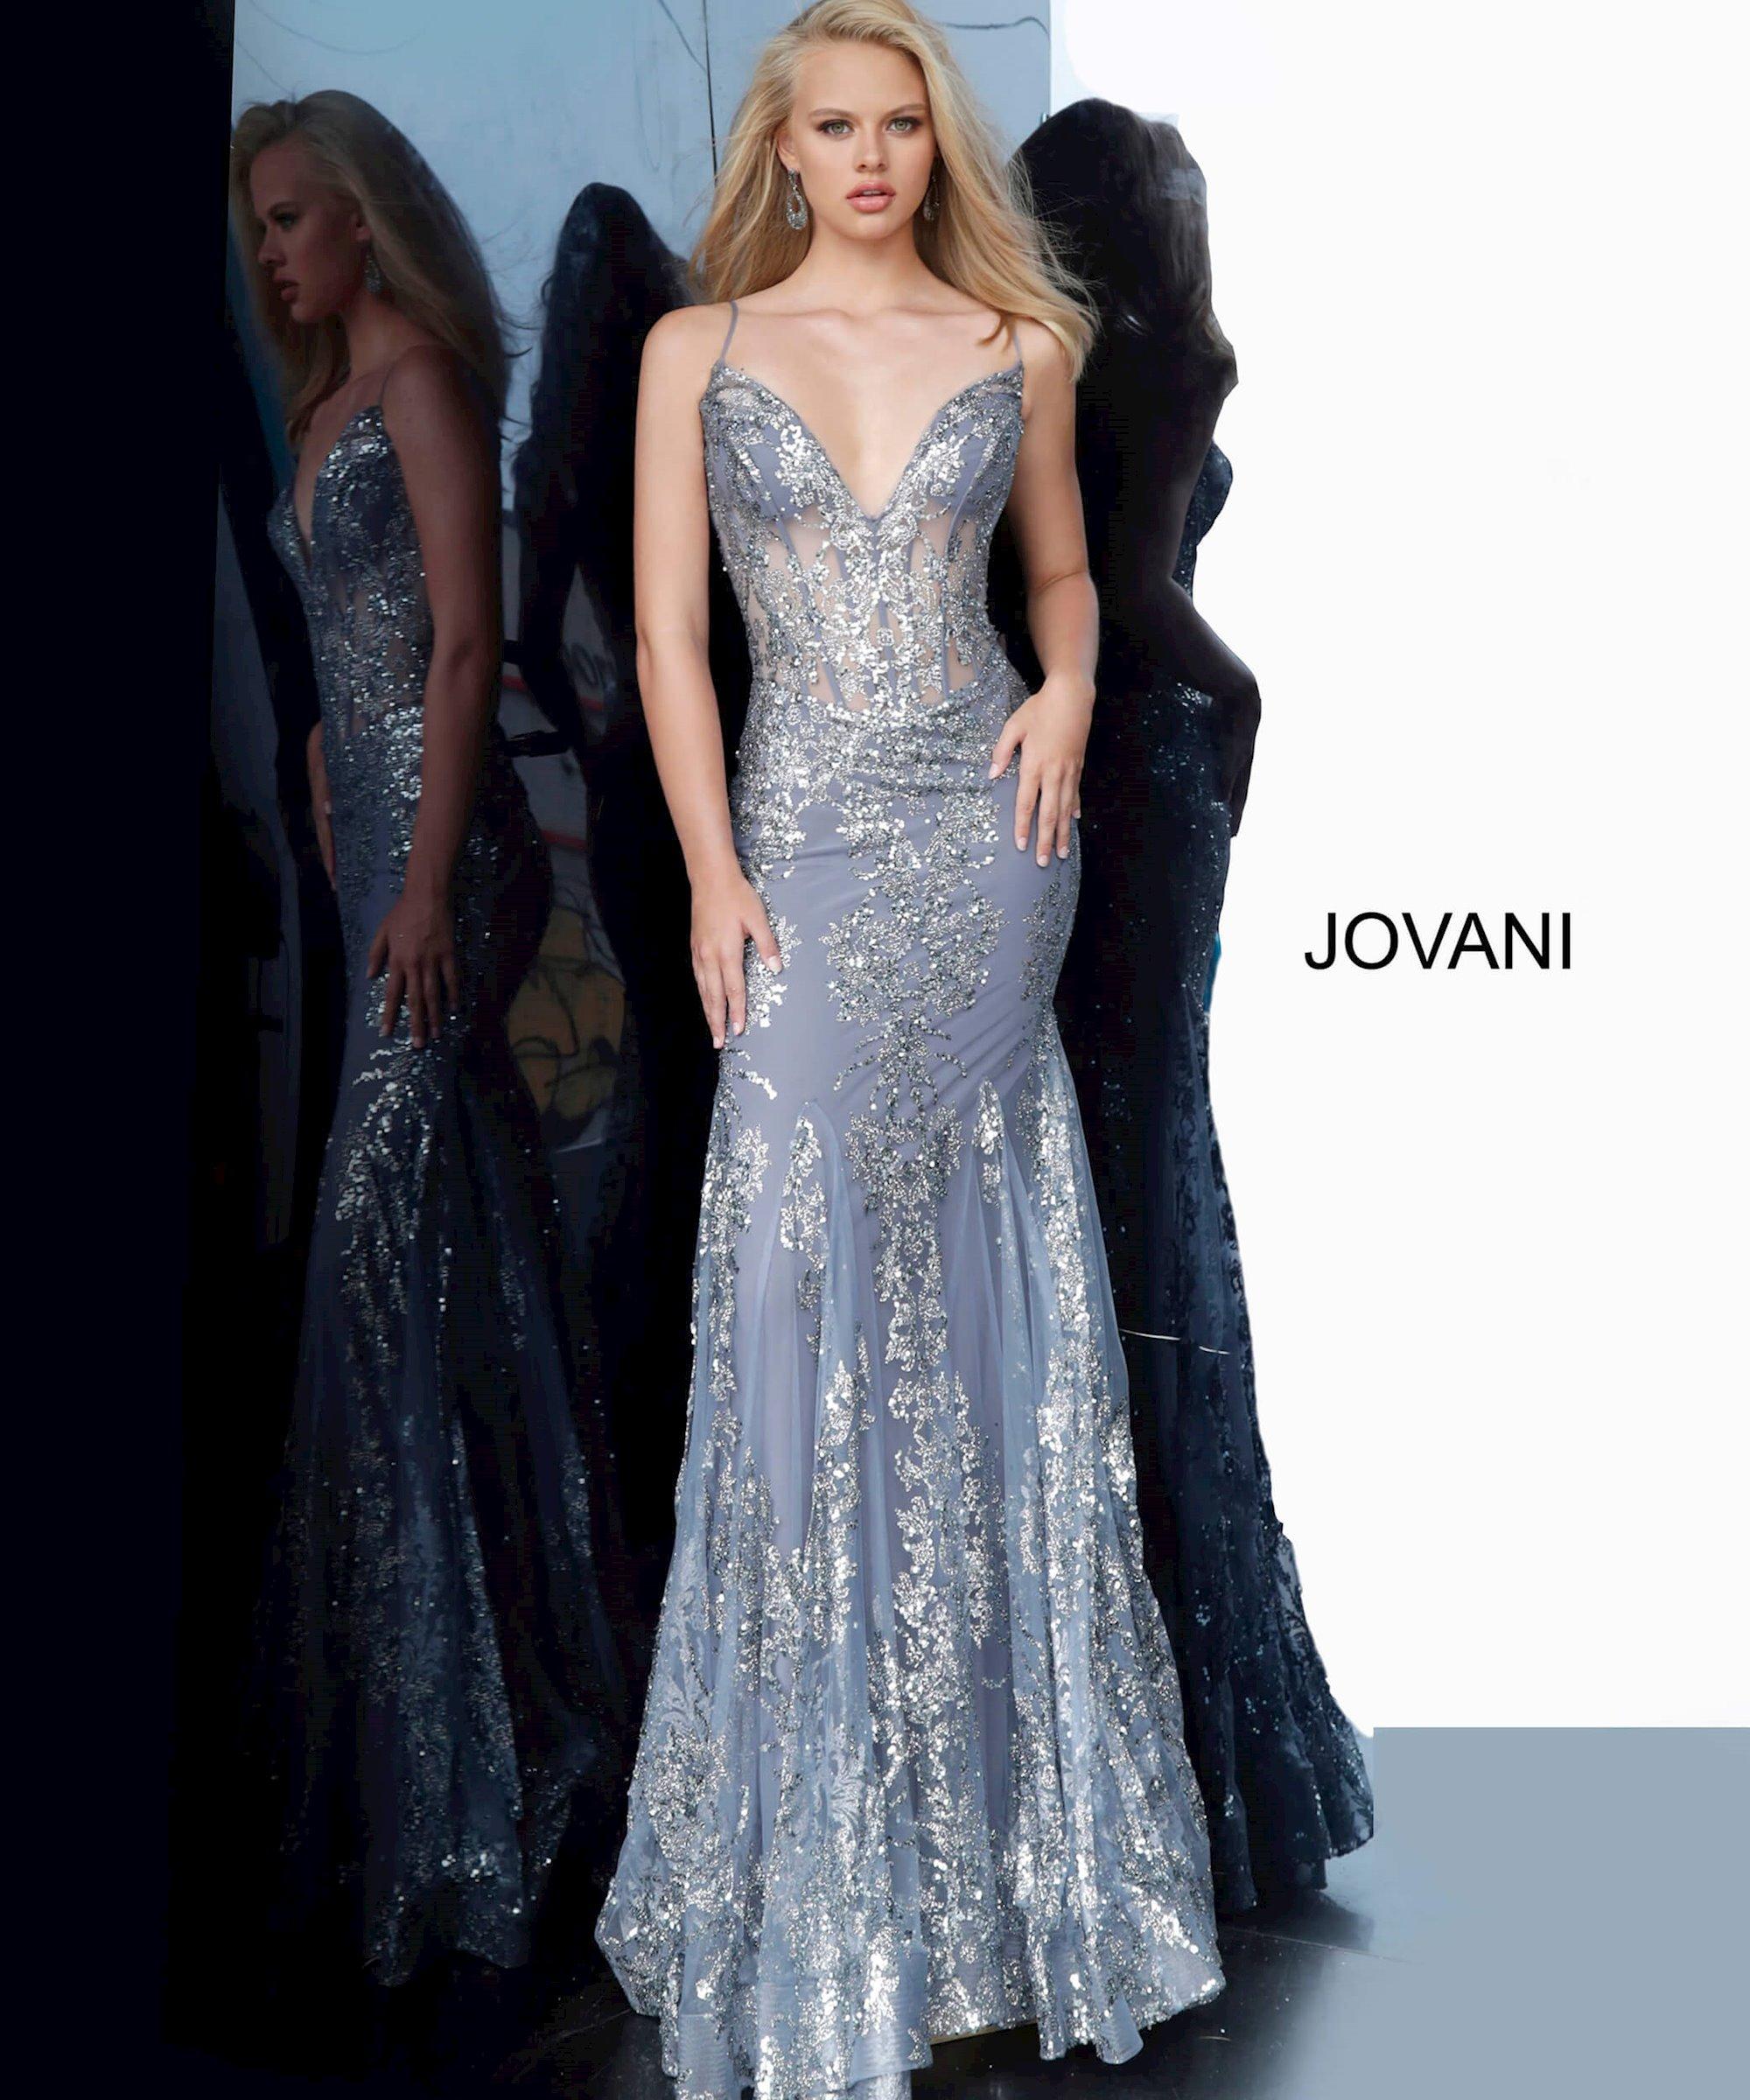 Jovani Dress 3675 - Henri's